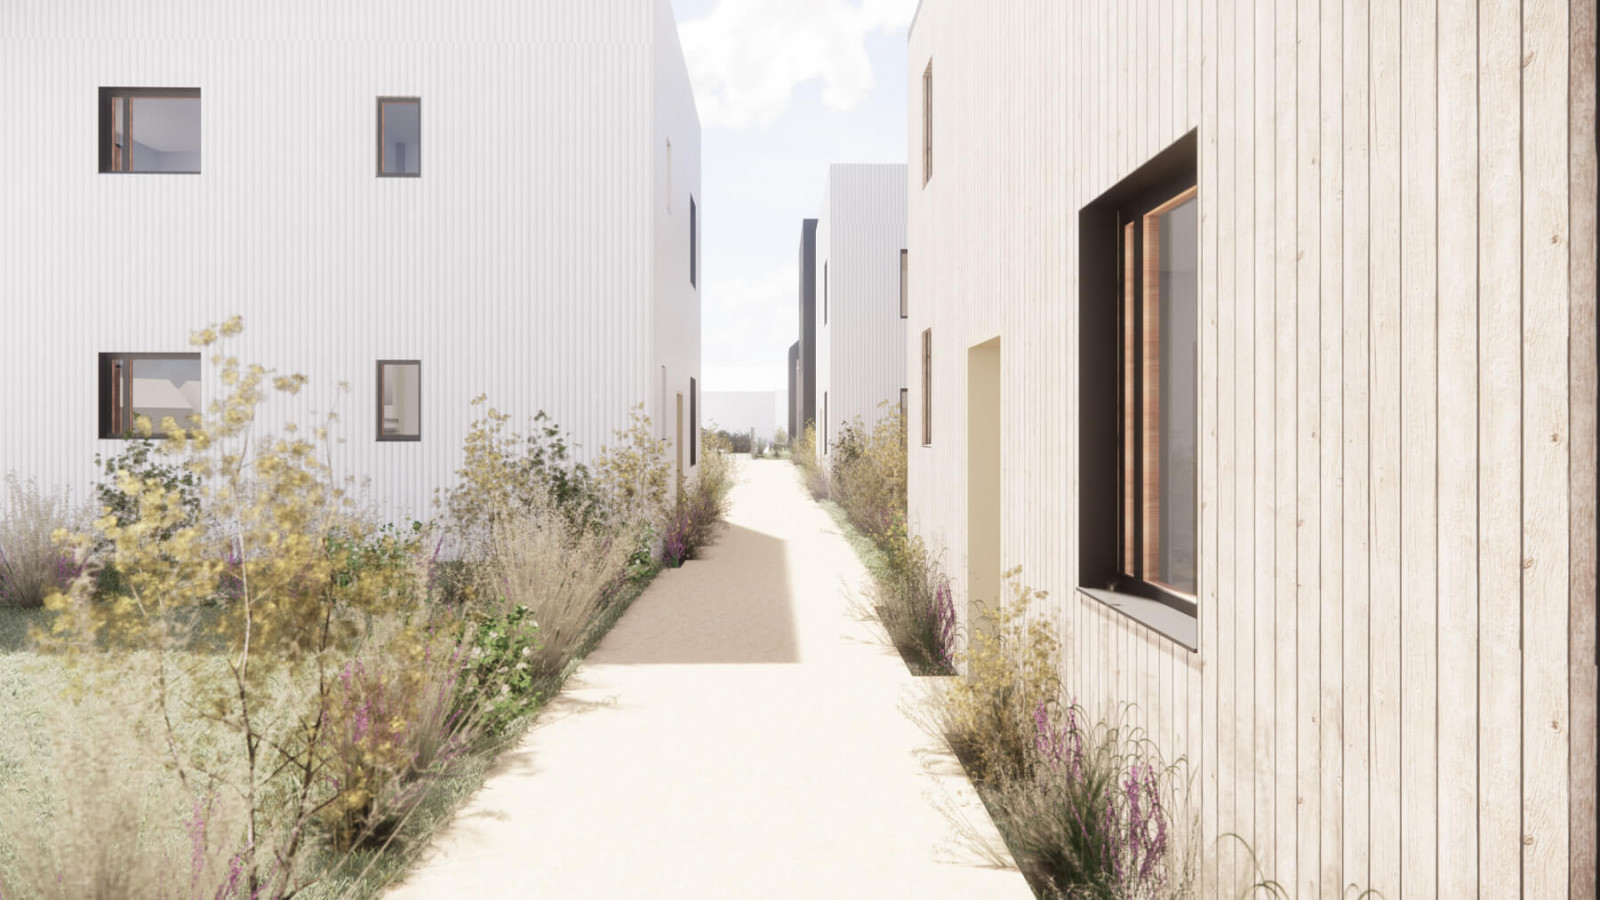 graam-treiges-02-logements-genlis-exterieur-venelle-jardin